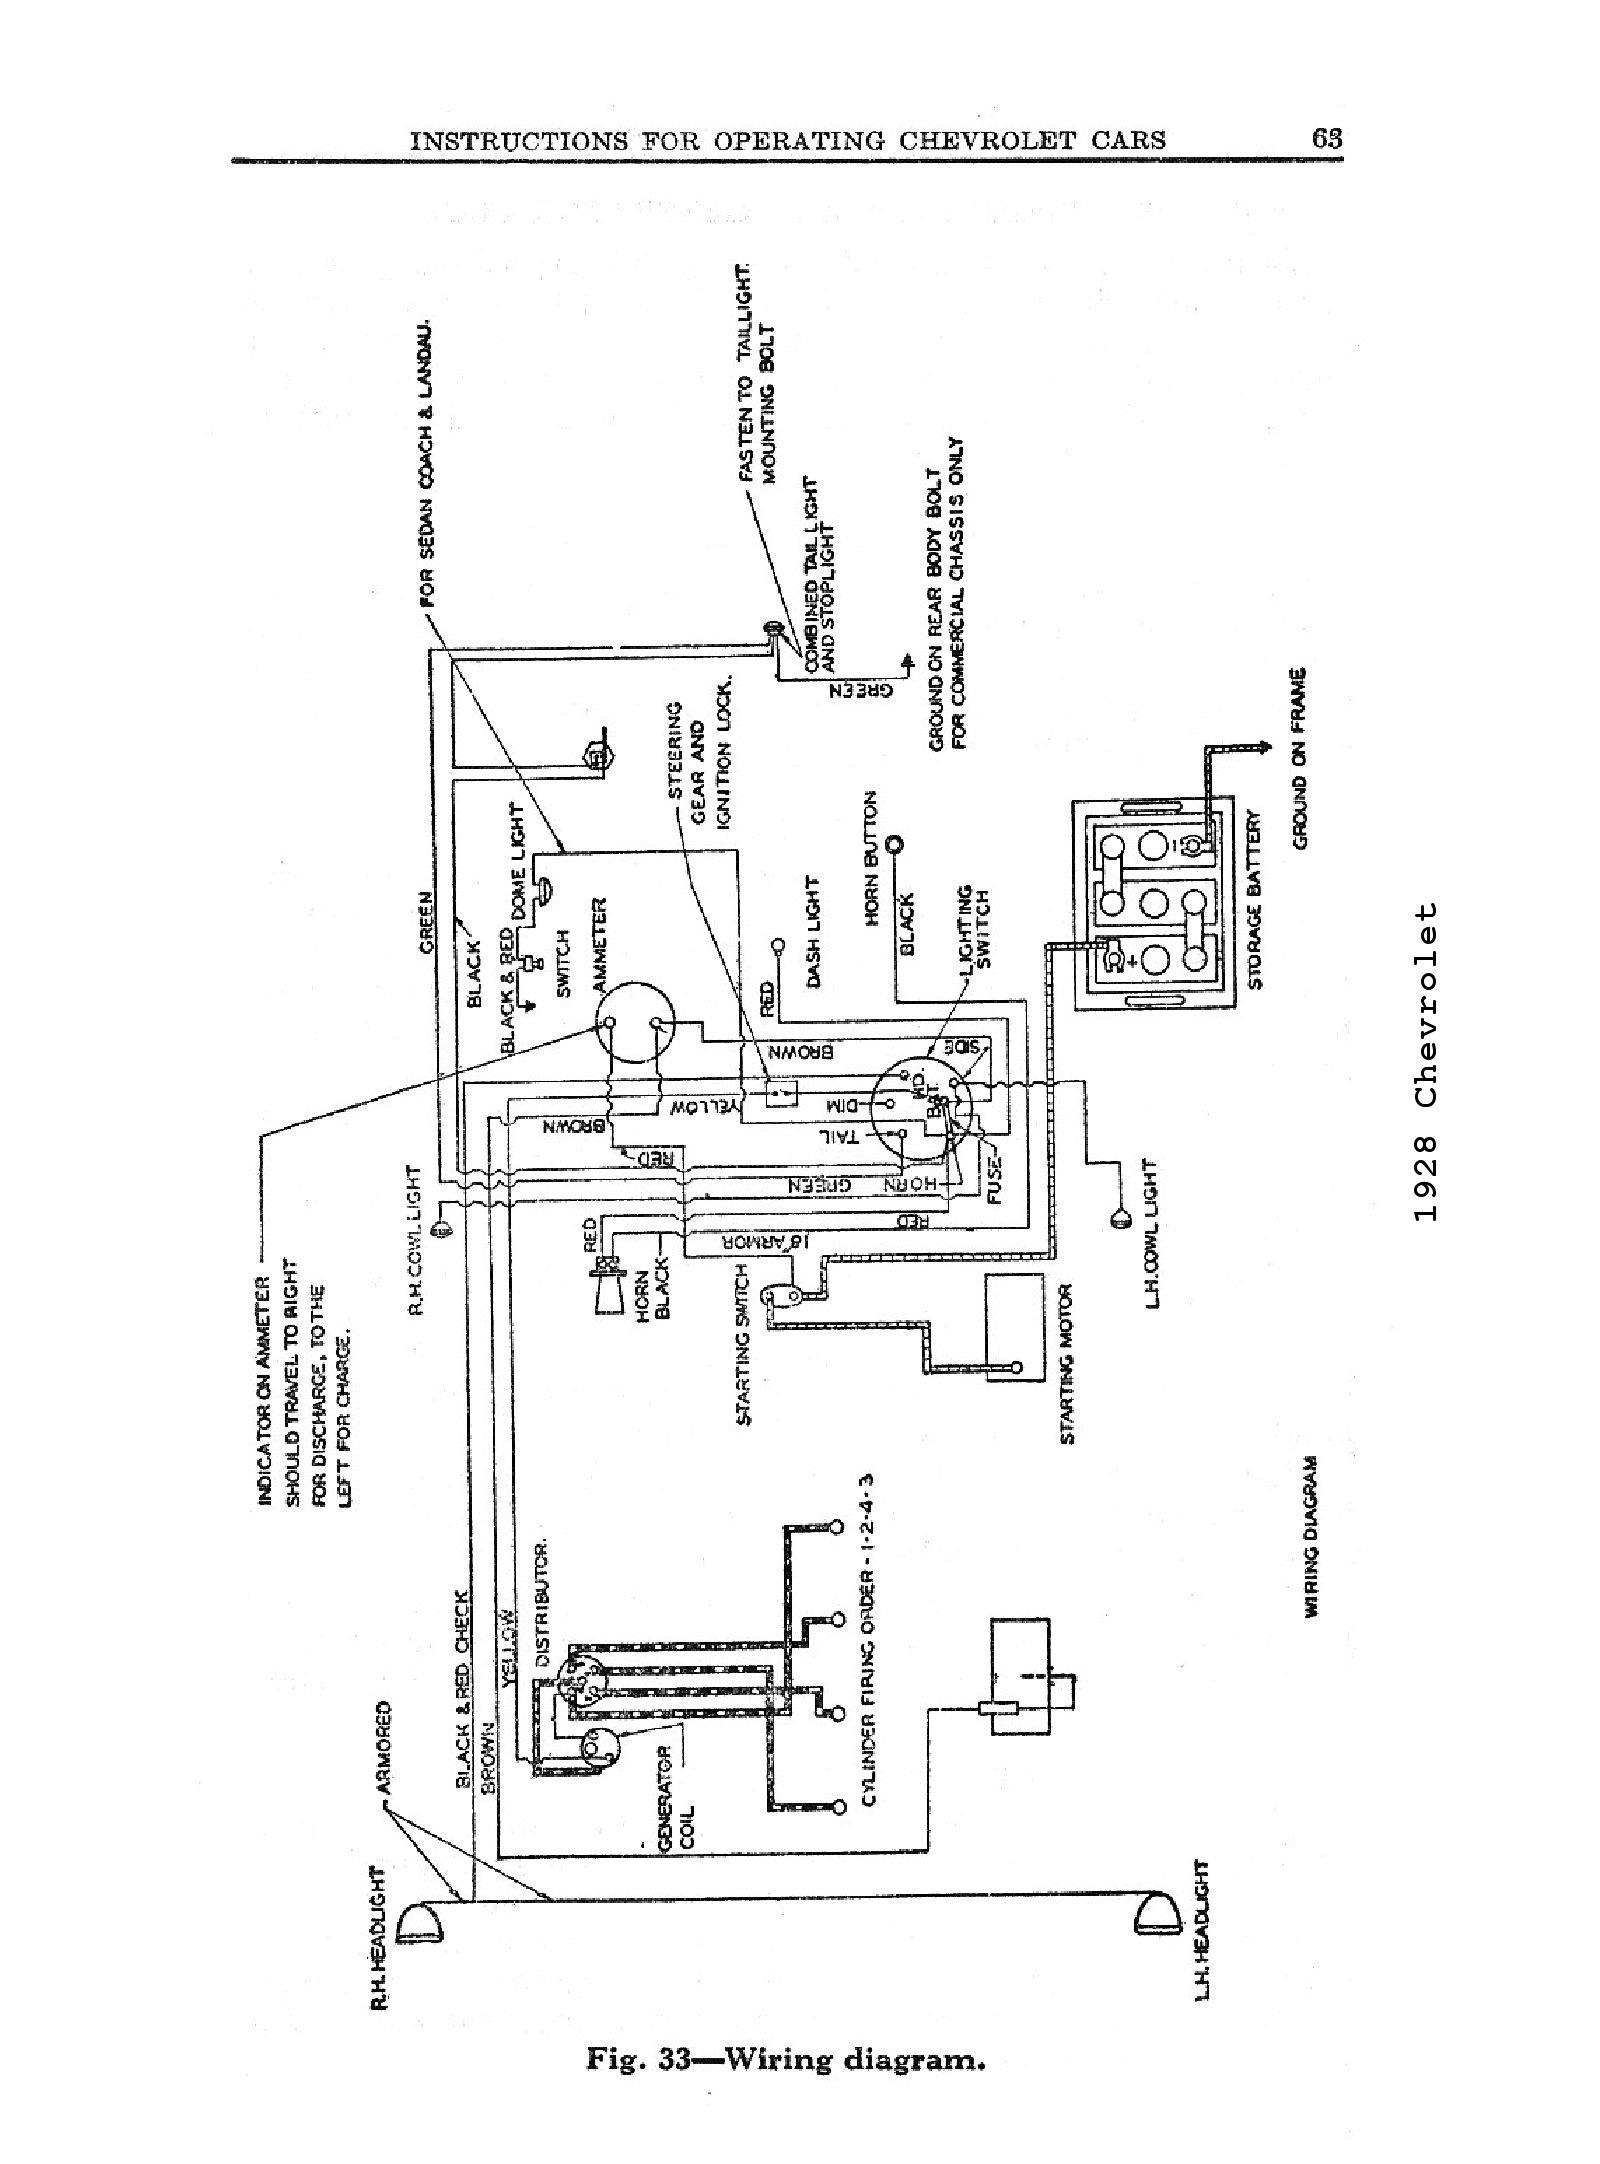 Holden Barina 98 Stereo Wiring Diagram